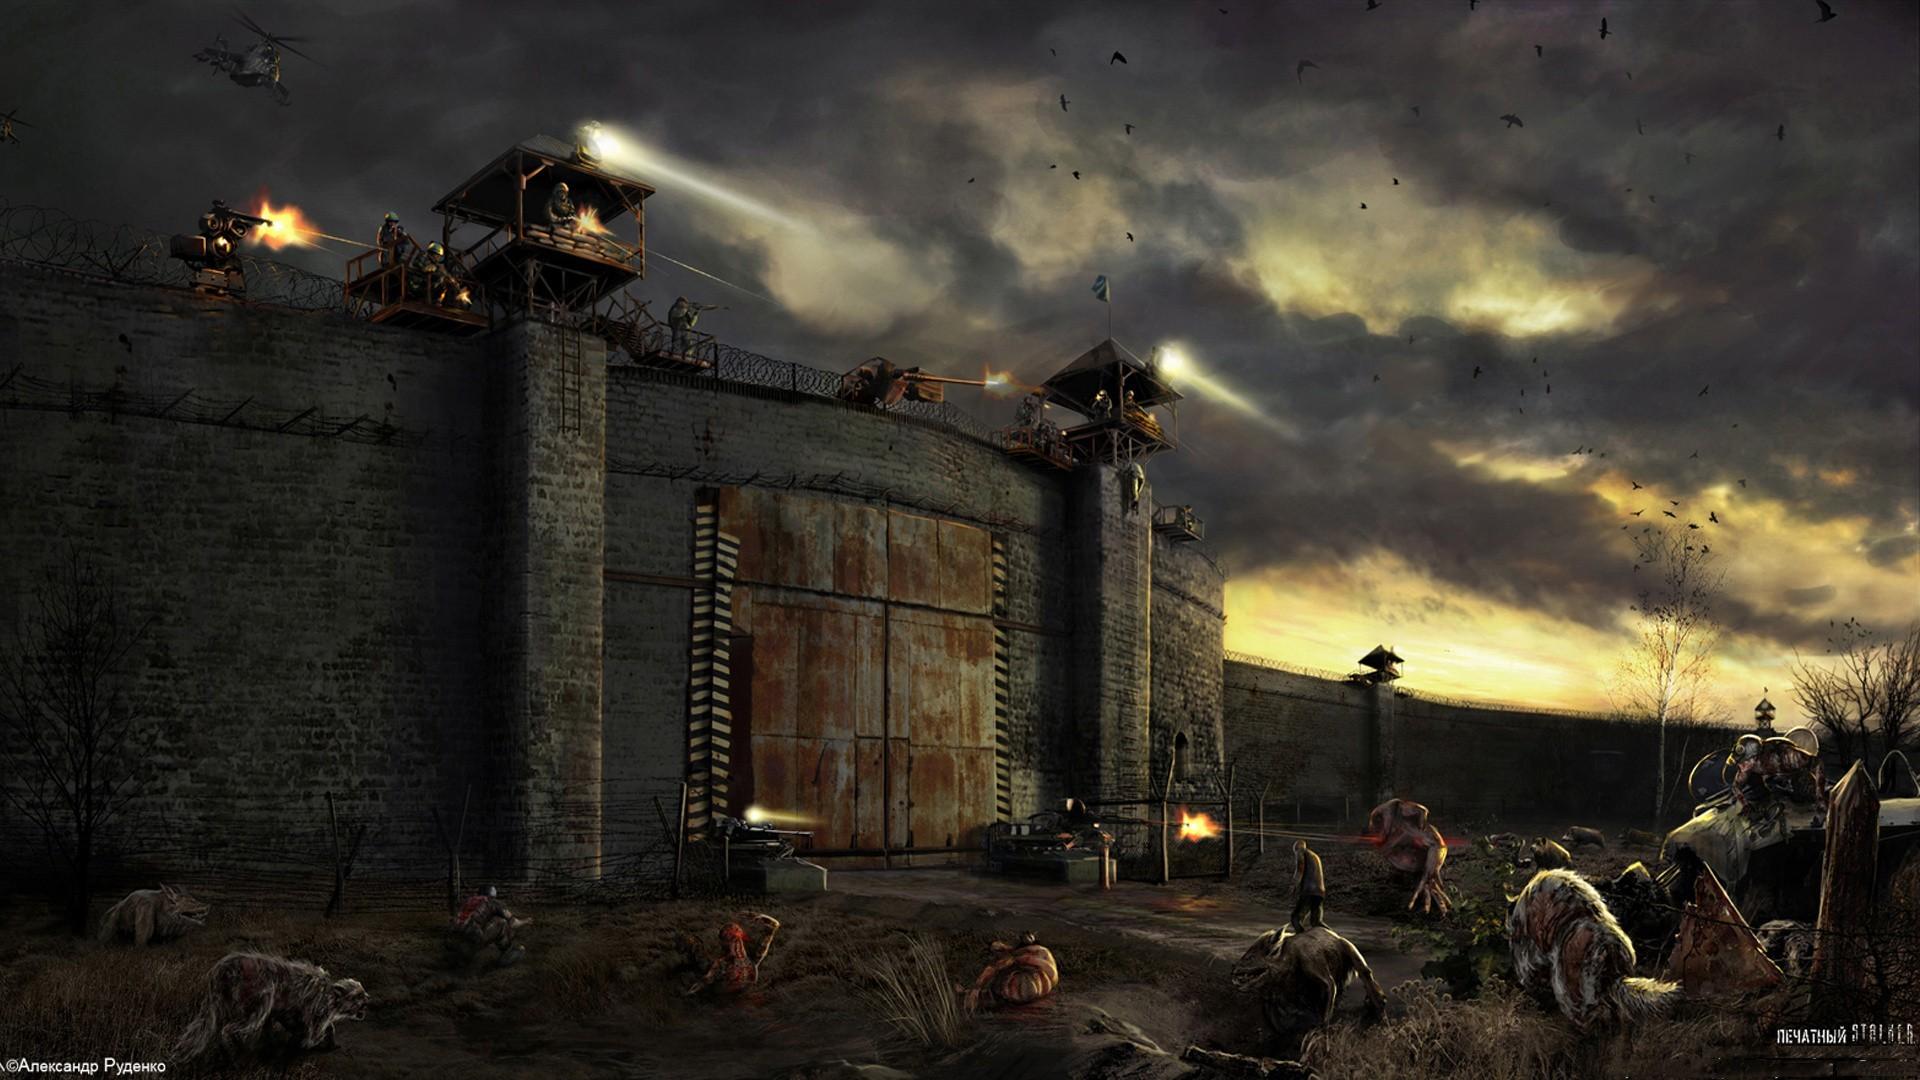 zombie apocalypse wallpaper – Google Search